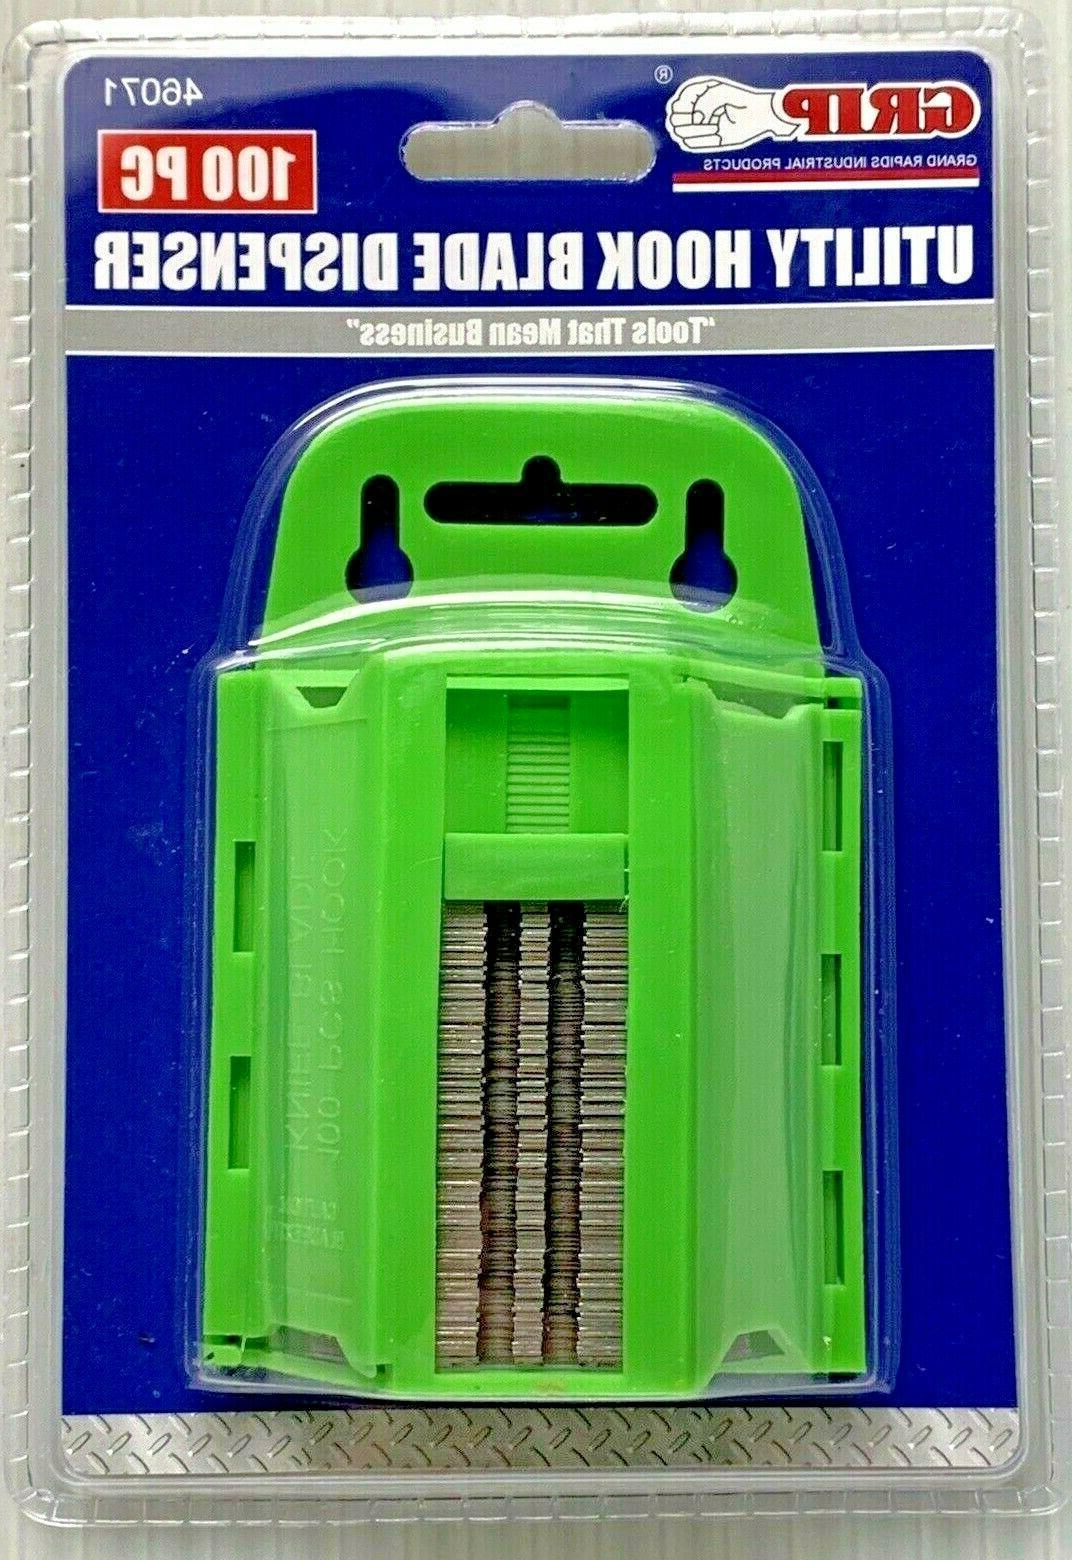 hook utility razor blades roofing